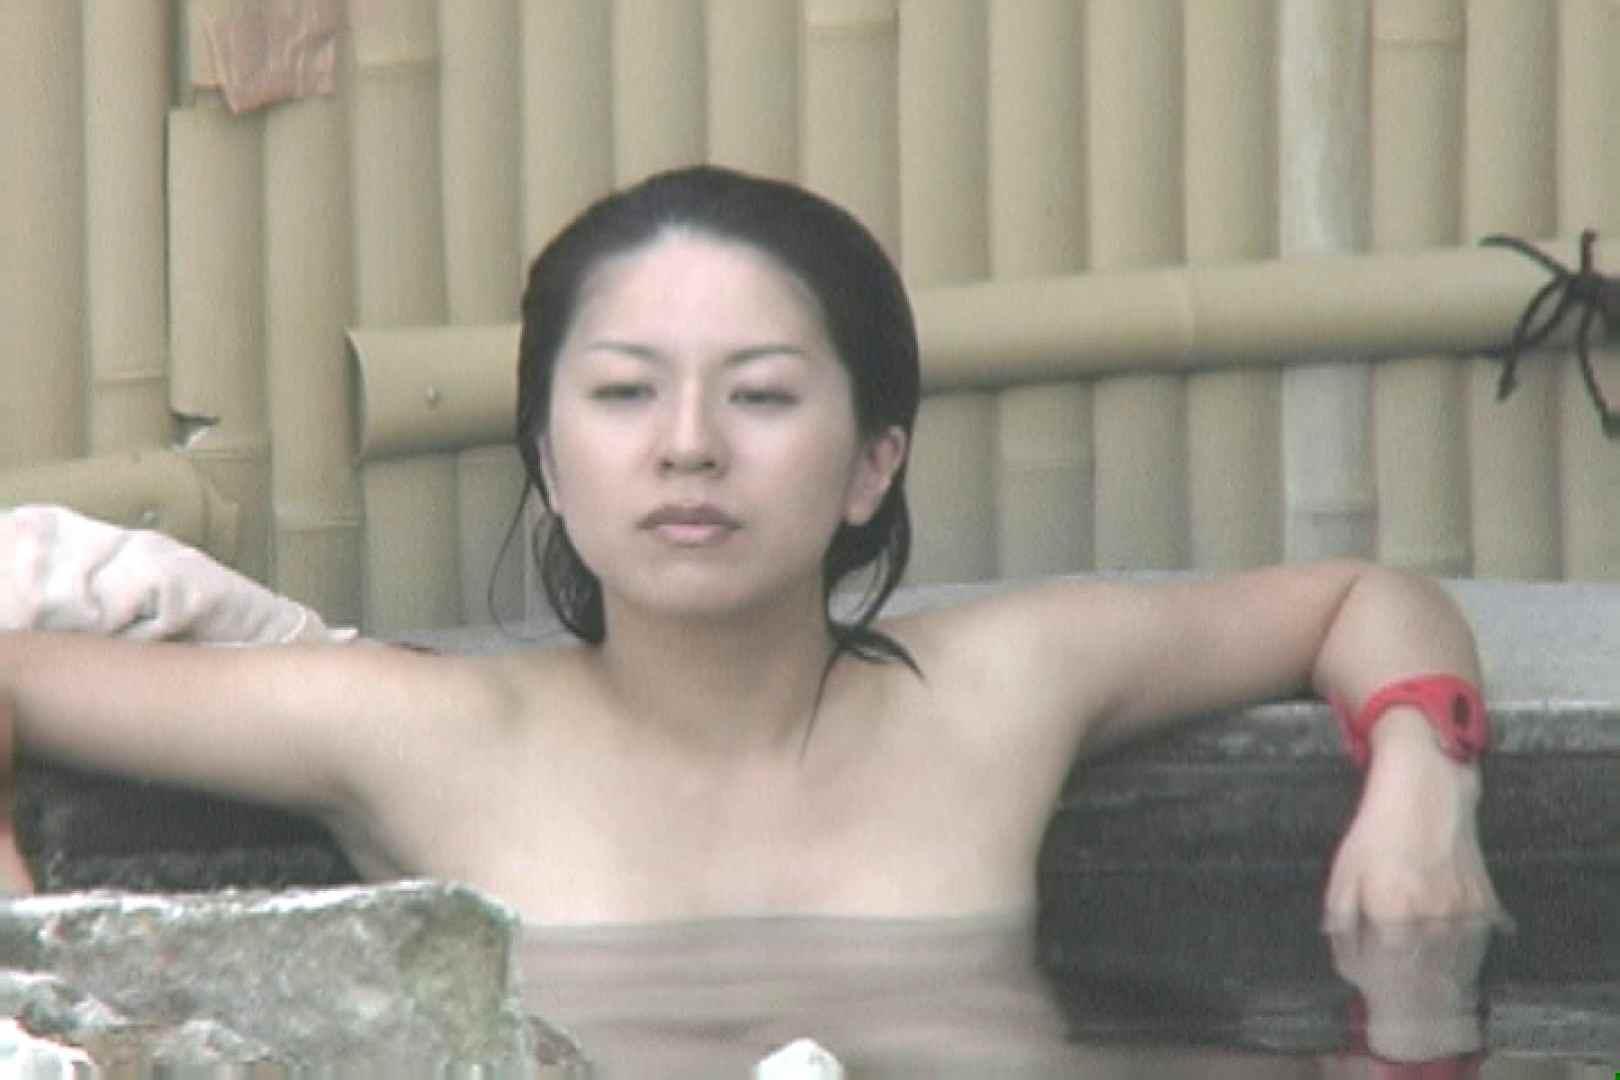 Aquaな露天風呂Vol.694 盗撮 | OLエロ画像  110PICs 61